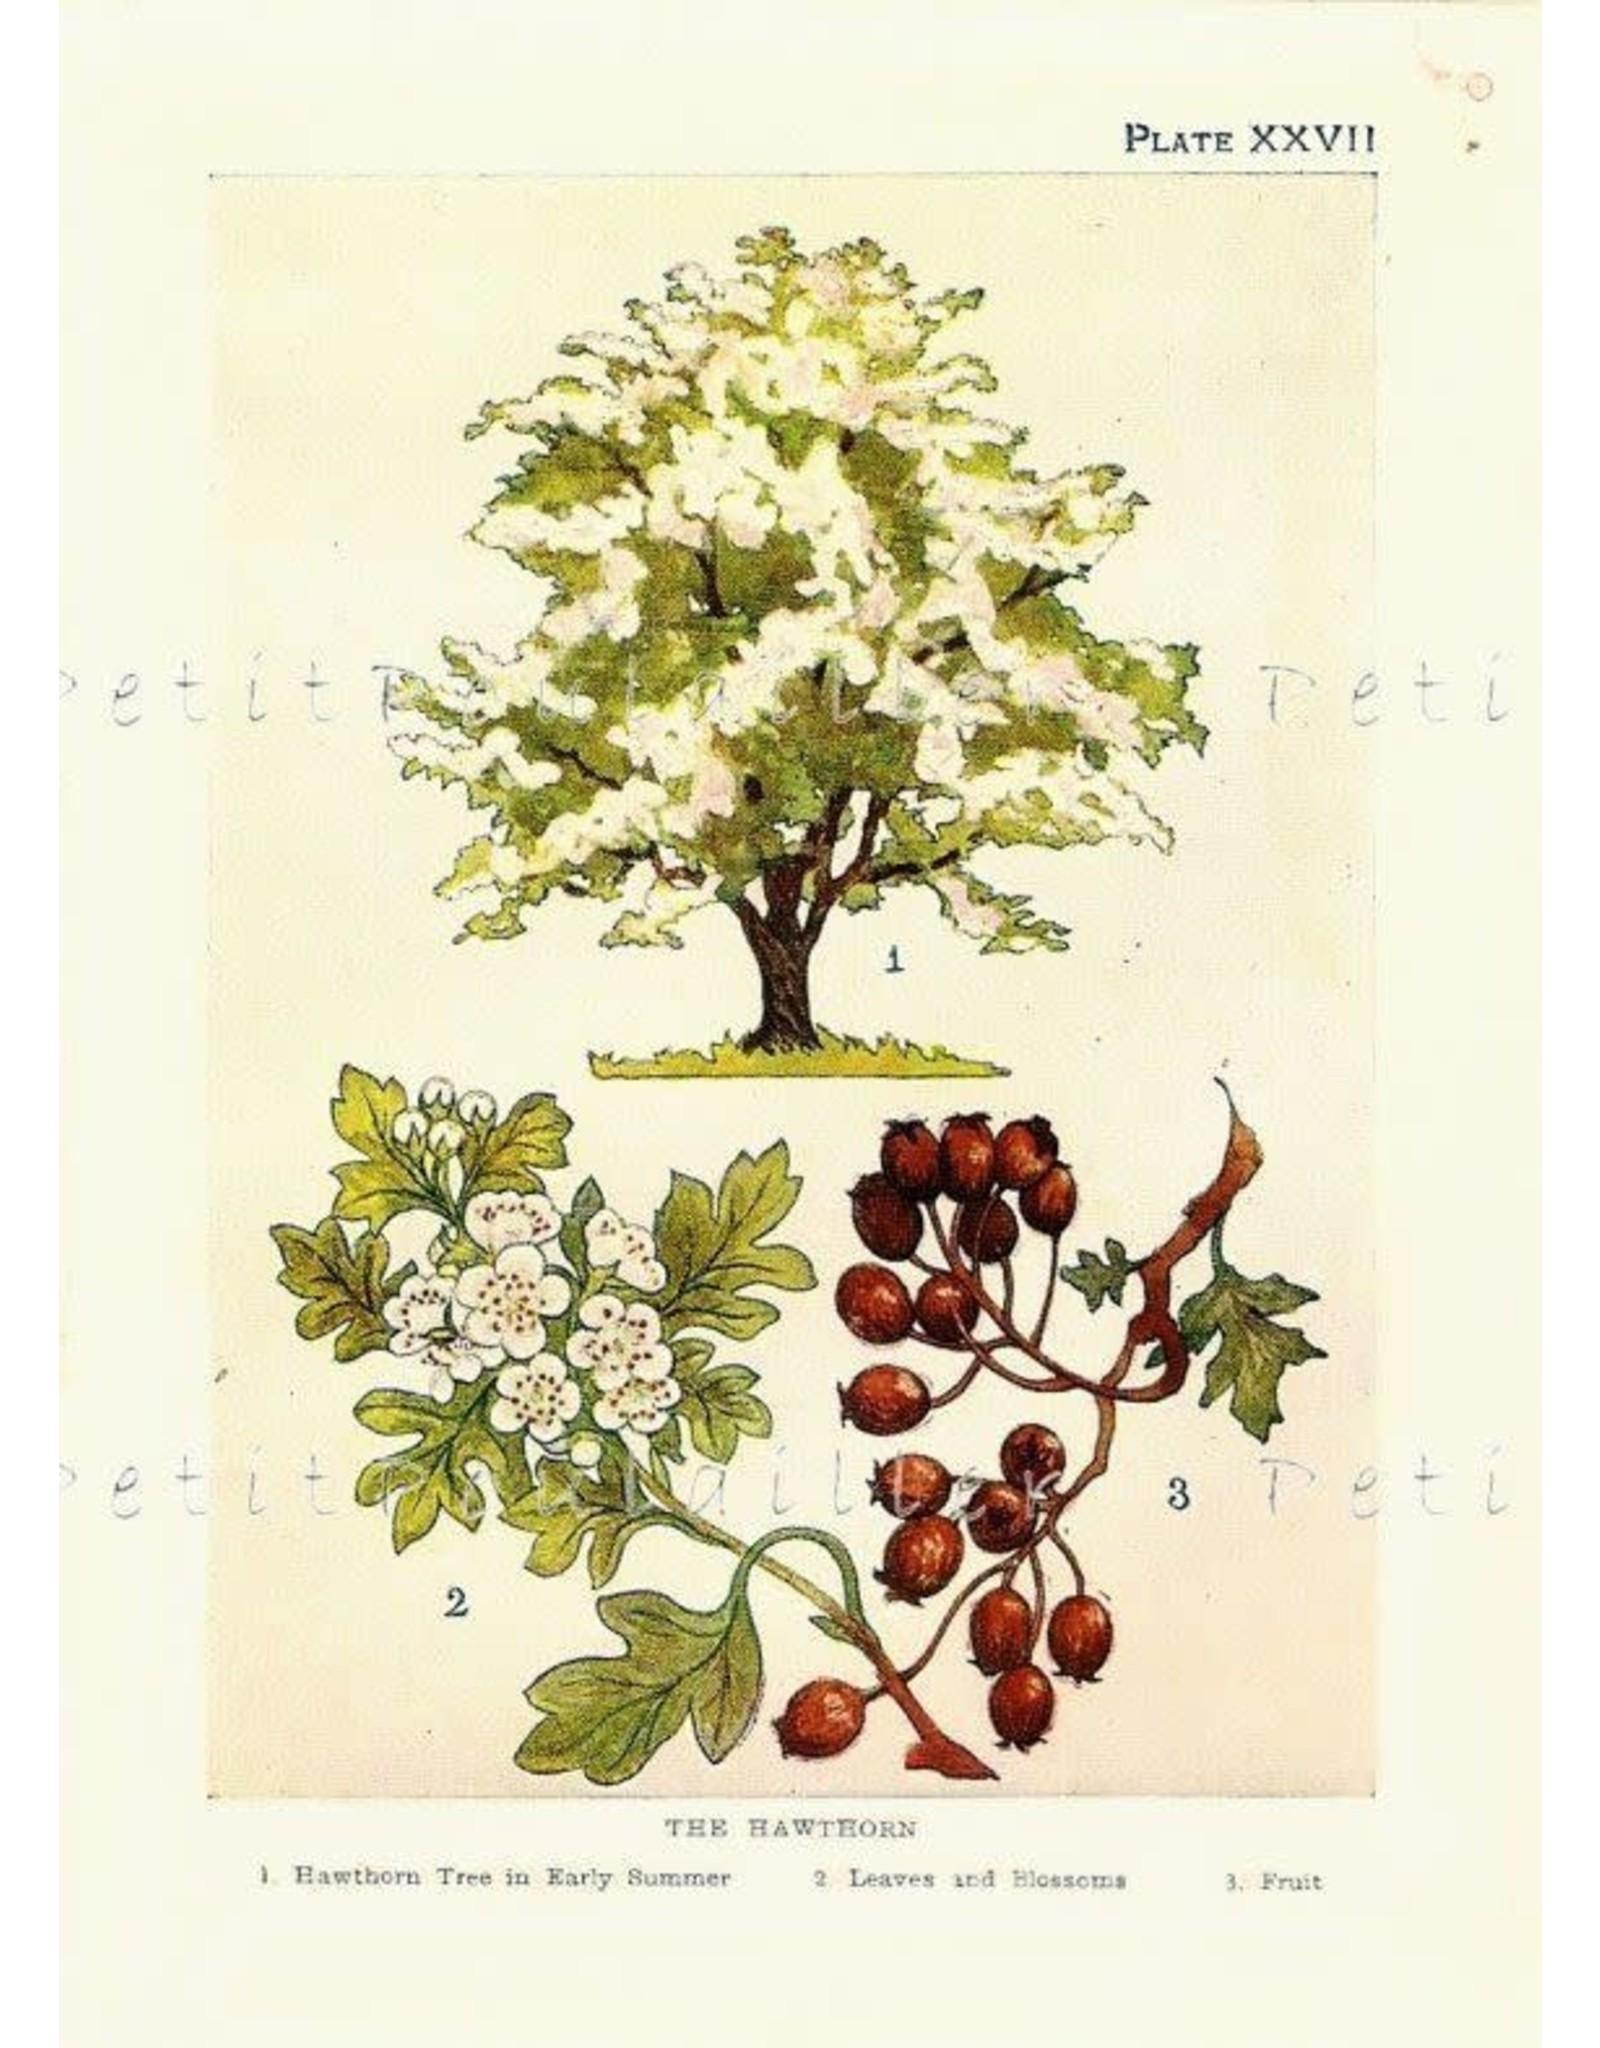 Hawthorn Berries | 1/2 oz.